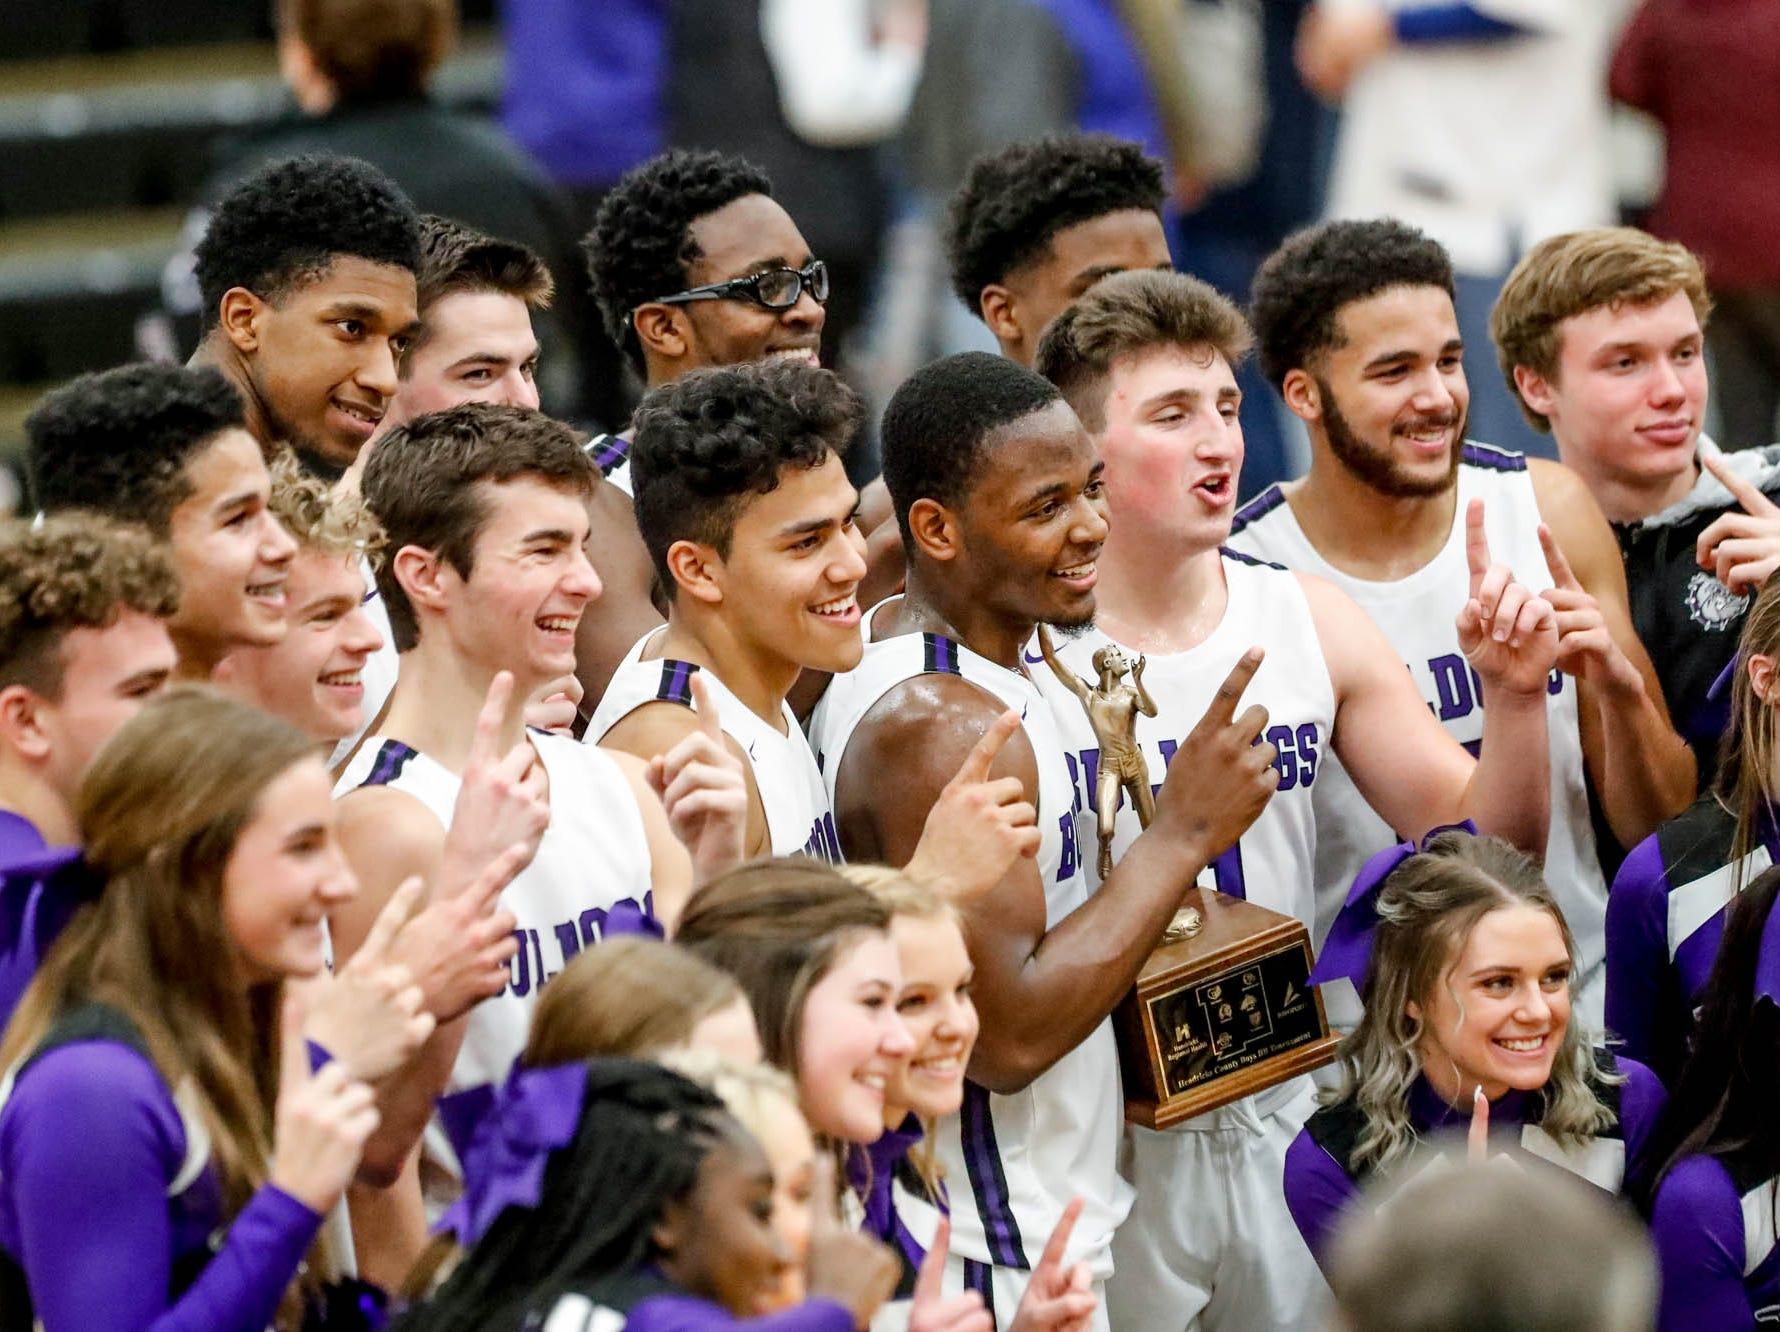 Brownsburg players pose for photos after winning the 2019 Hendricks County Basketball Tournament game between the Avon High School boys varsity basketball team and Brownsburg High School, held at Cascade High School on Saturday, Jan. 5, 2019.